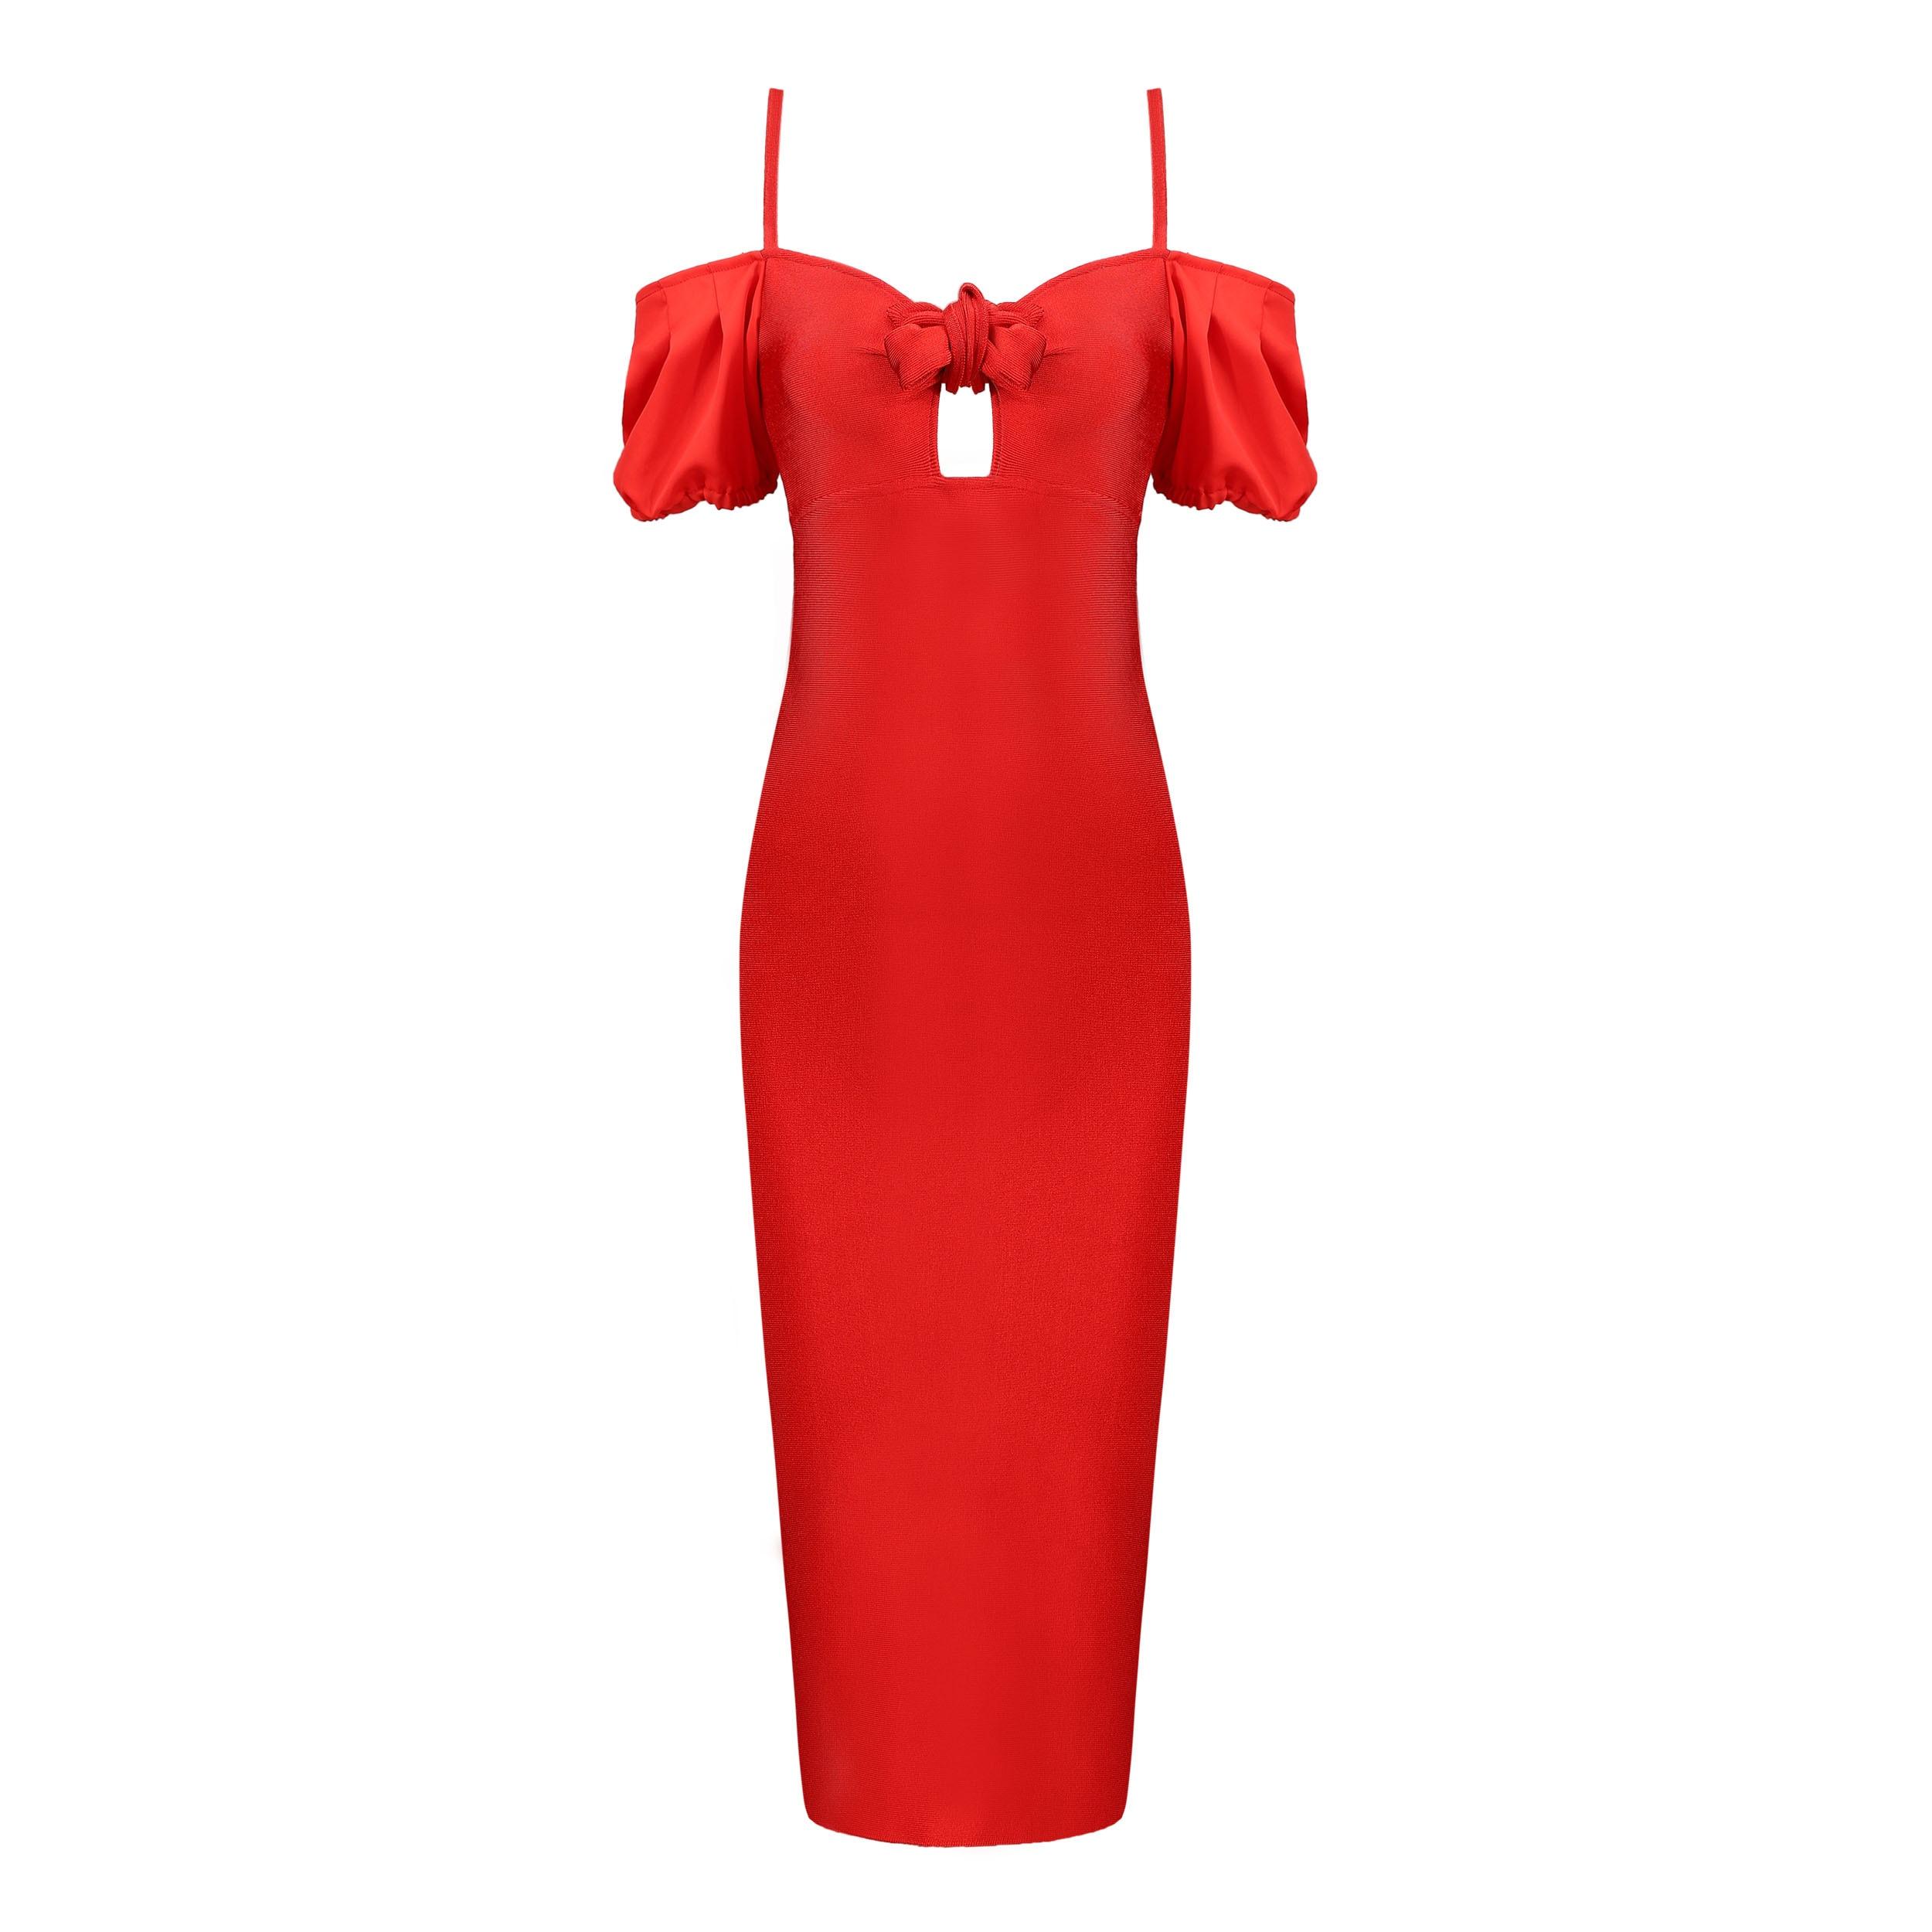 Deavogy 2018ใหม่ผู้หญิงปาเก็ตตี้สายB Odyconพรรคผ้าพันแผลชุด-ใน ชุดเดรส จาก เสื้อผ้าสตรี บน AliExpress - 11.11_สิบเอ็ด สิบเอ็ดวันคนโสด 1